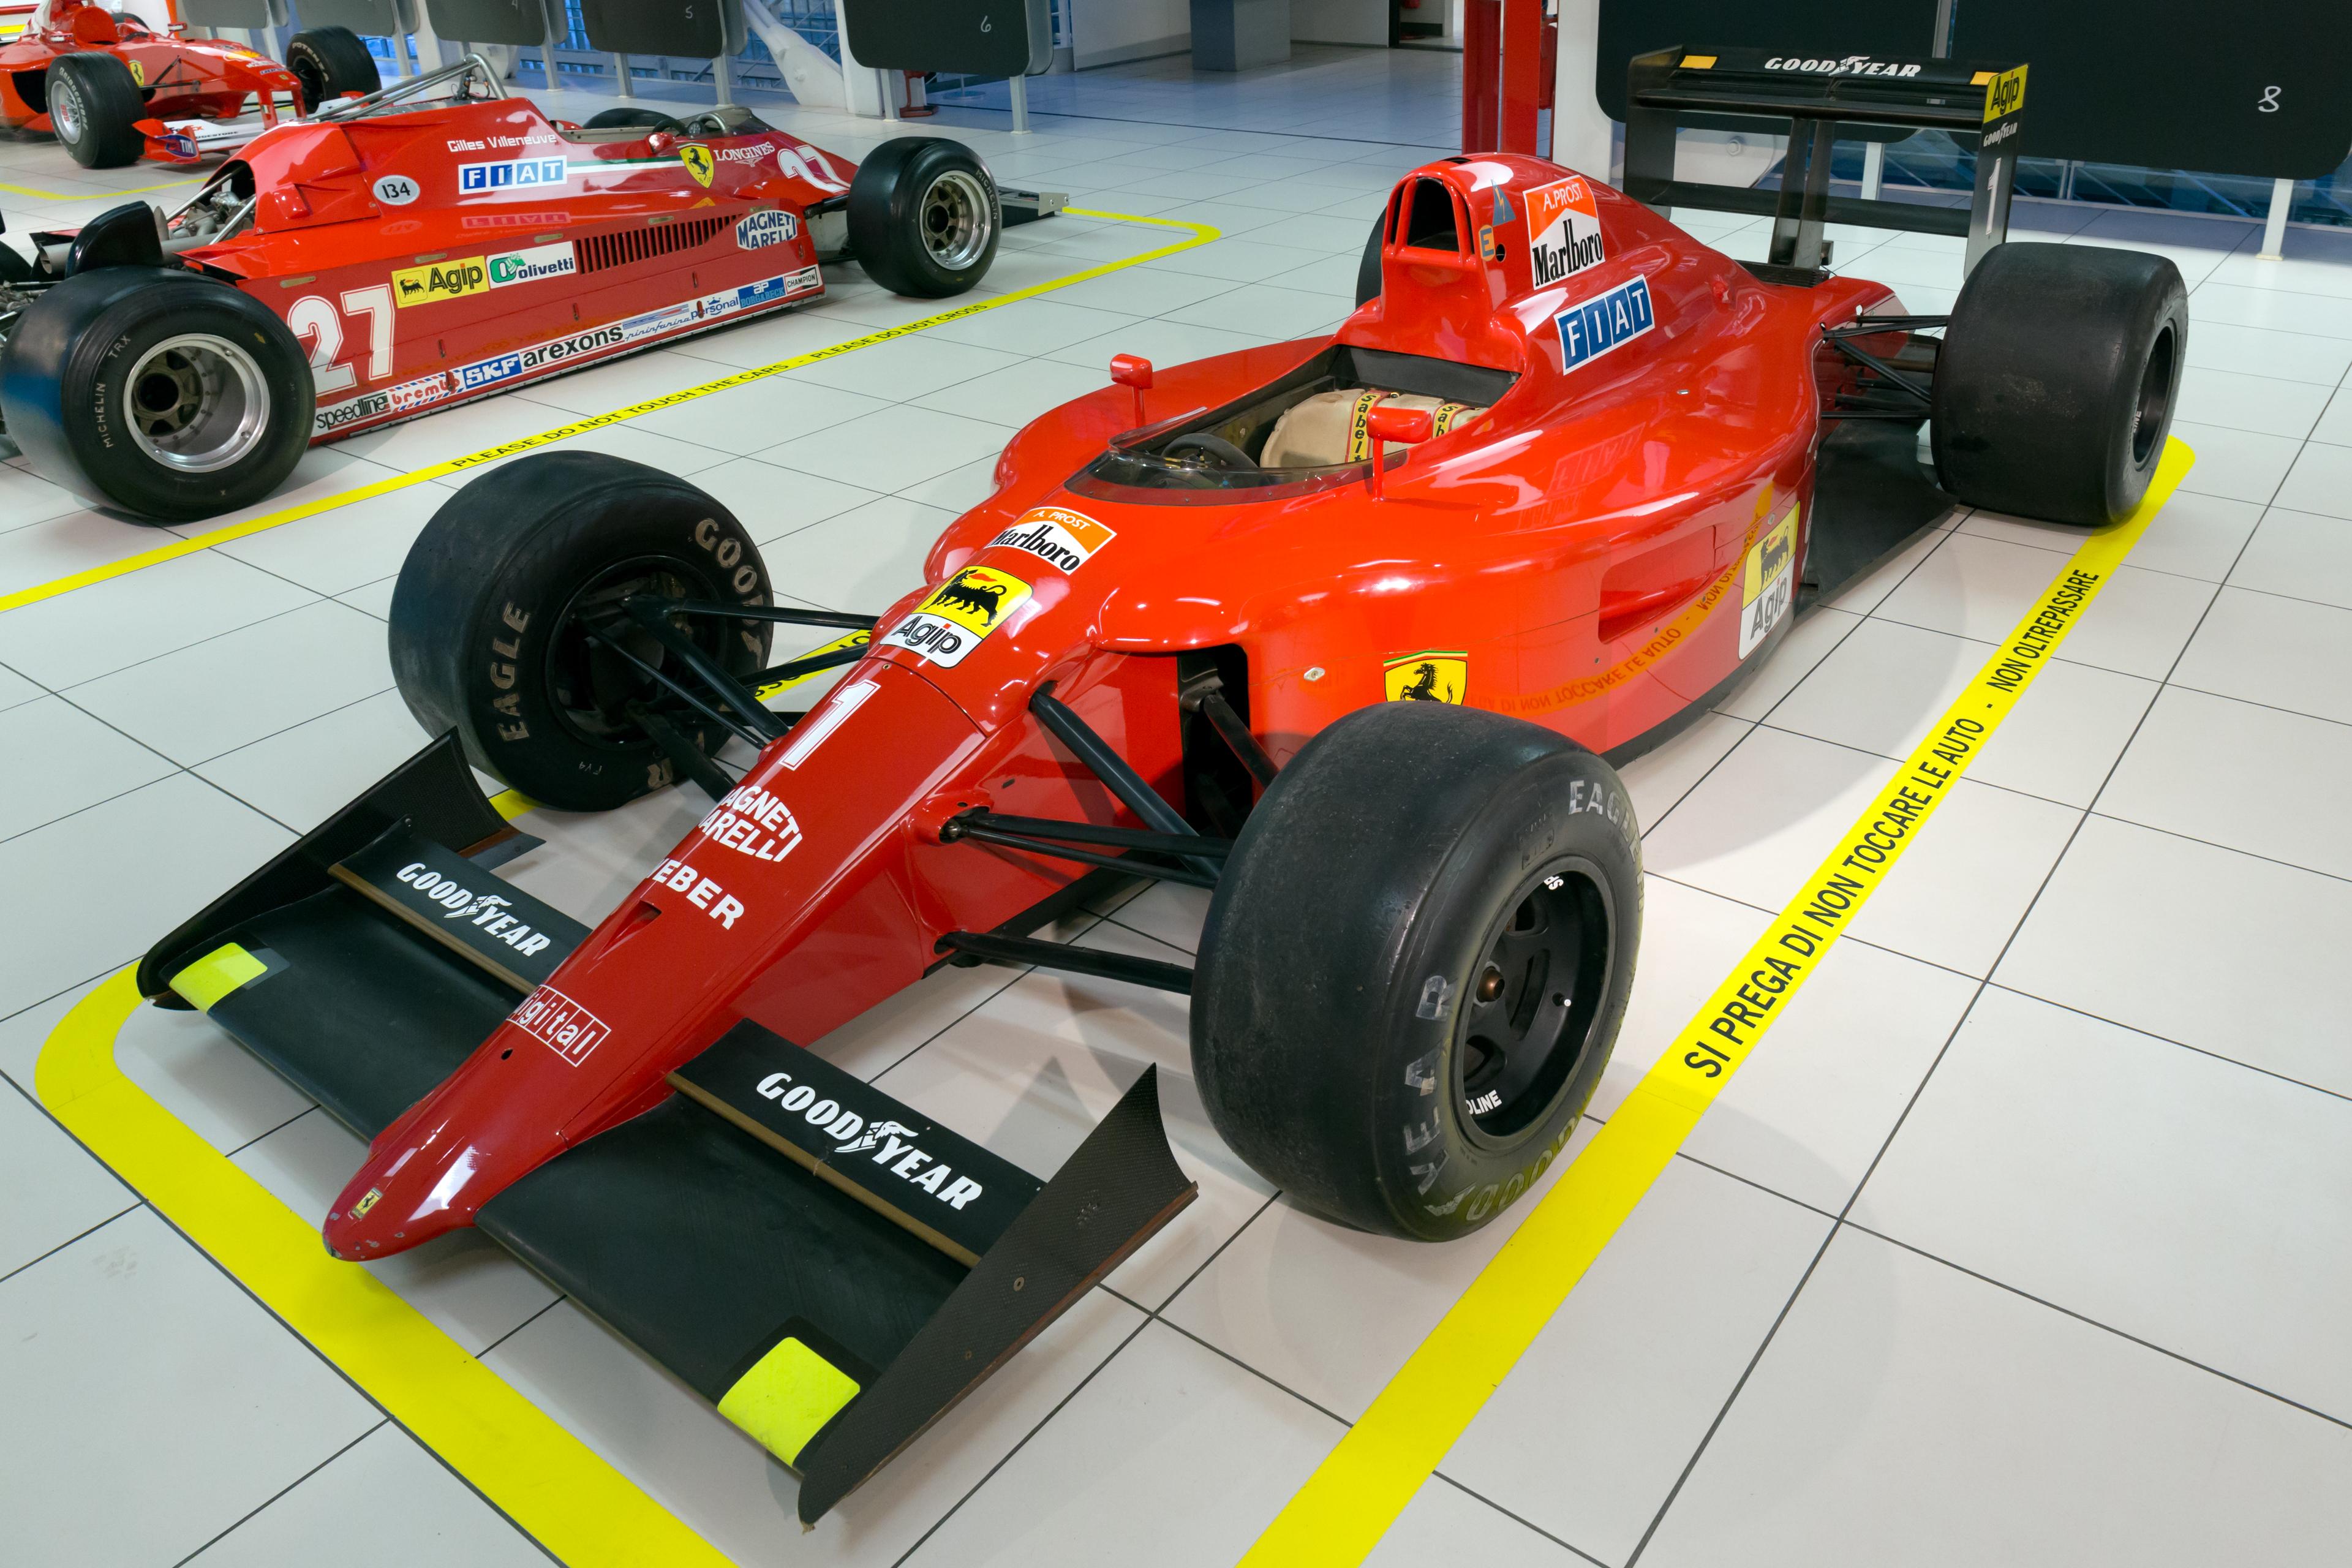 File:Ferrari 641-2 front-left2 Museo Ferrari.jpg